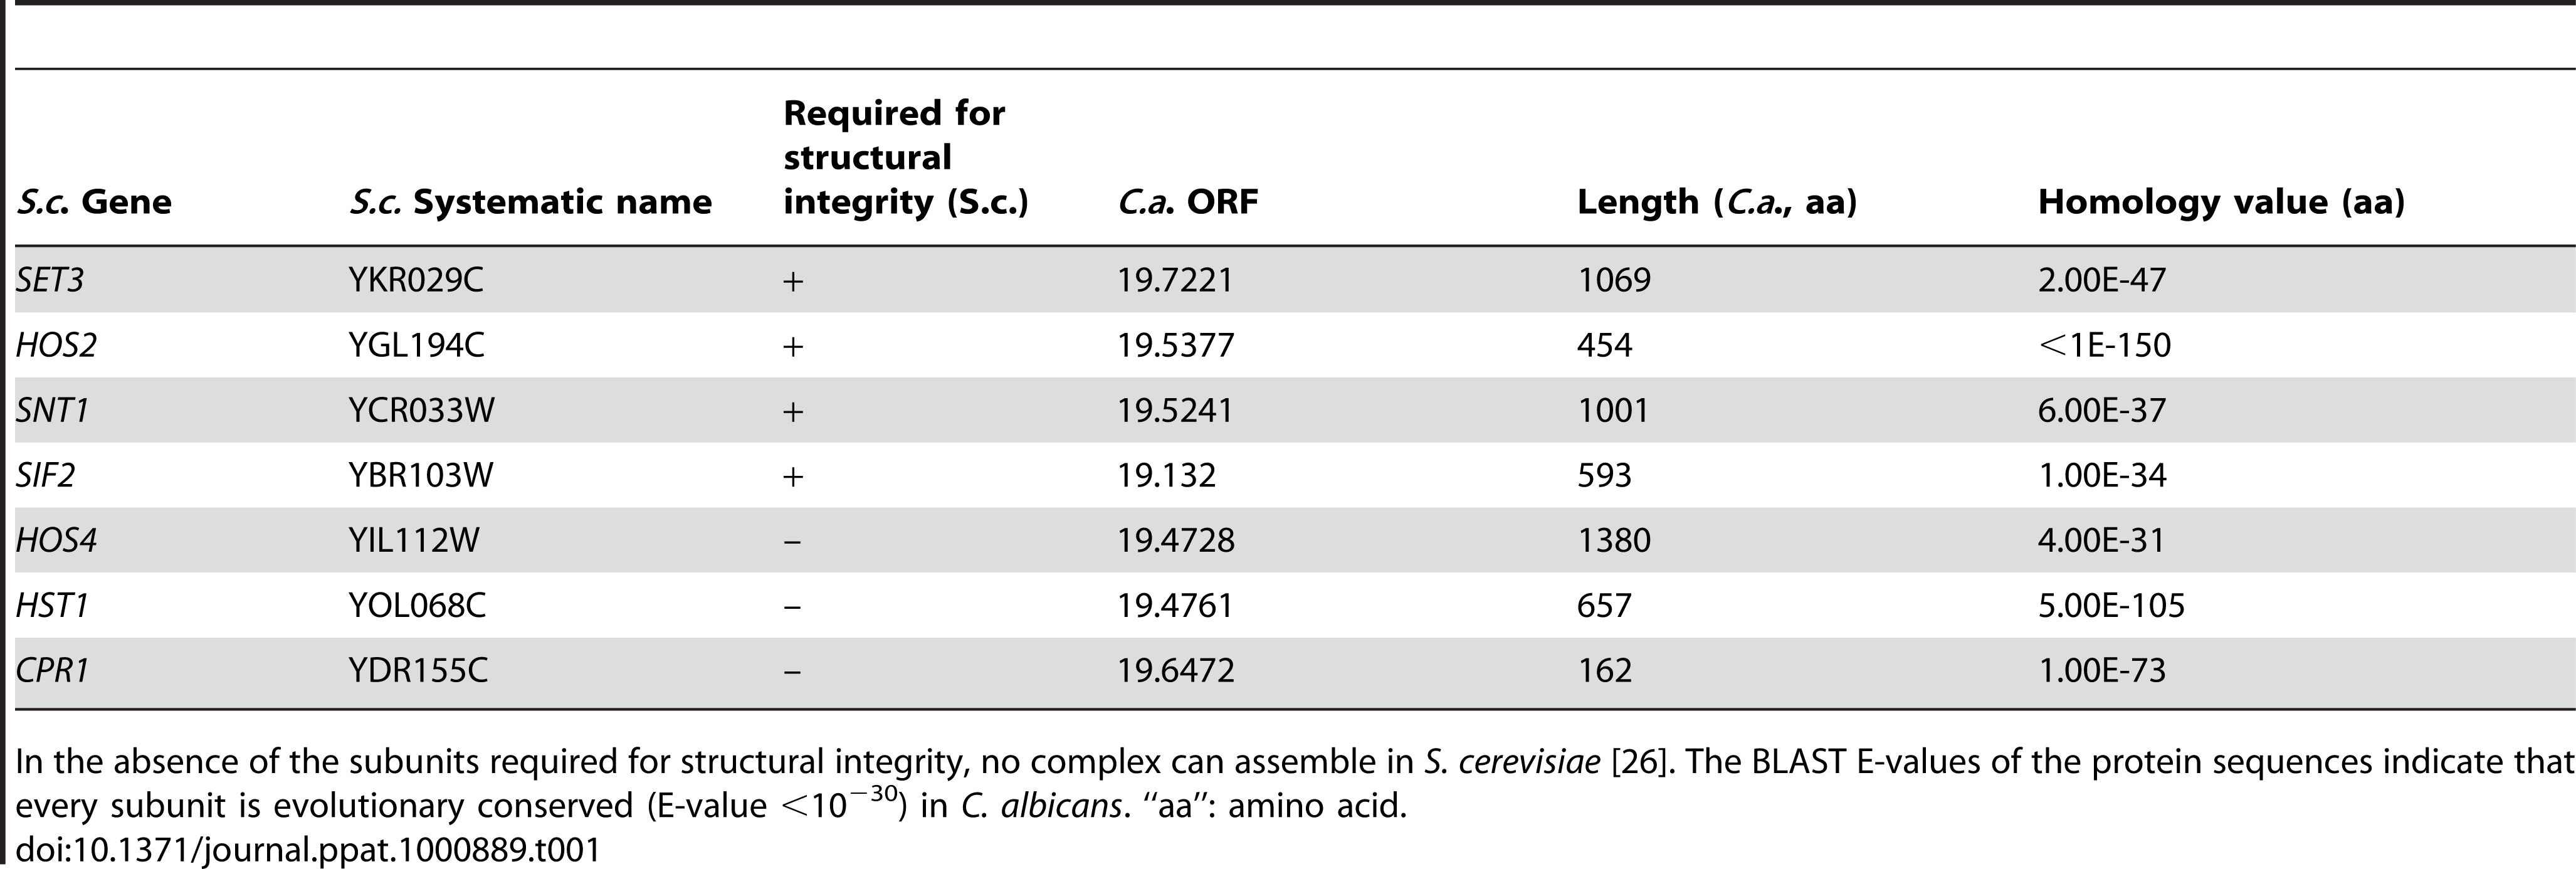 Components of the <i>S. cerevisiae</i> and <i>C. albicans</i> Set3 Complex components.